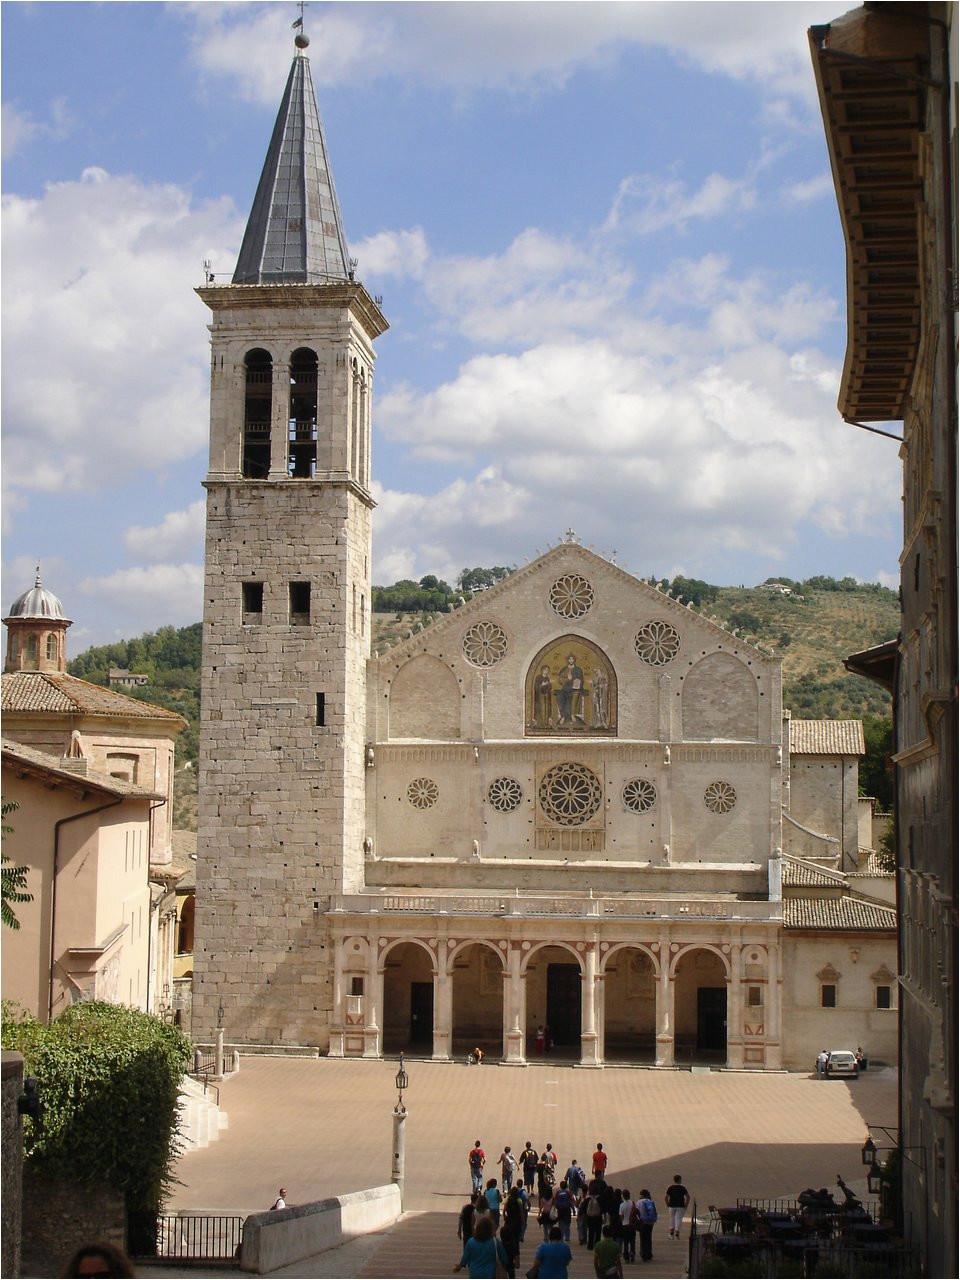 spoleto 2019 best of spoleto italy tourism tripadvisor